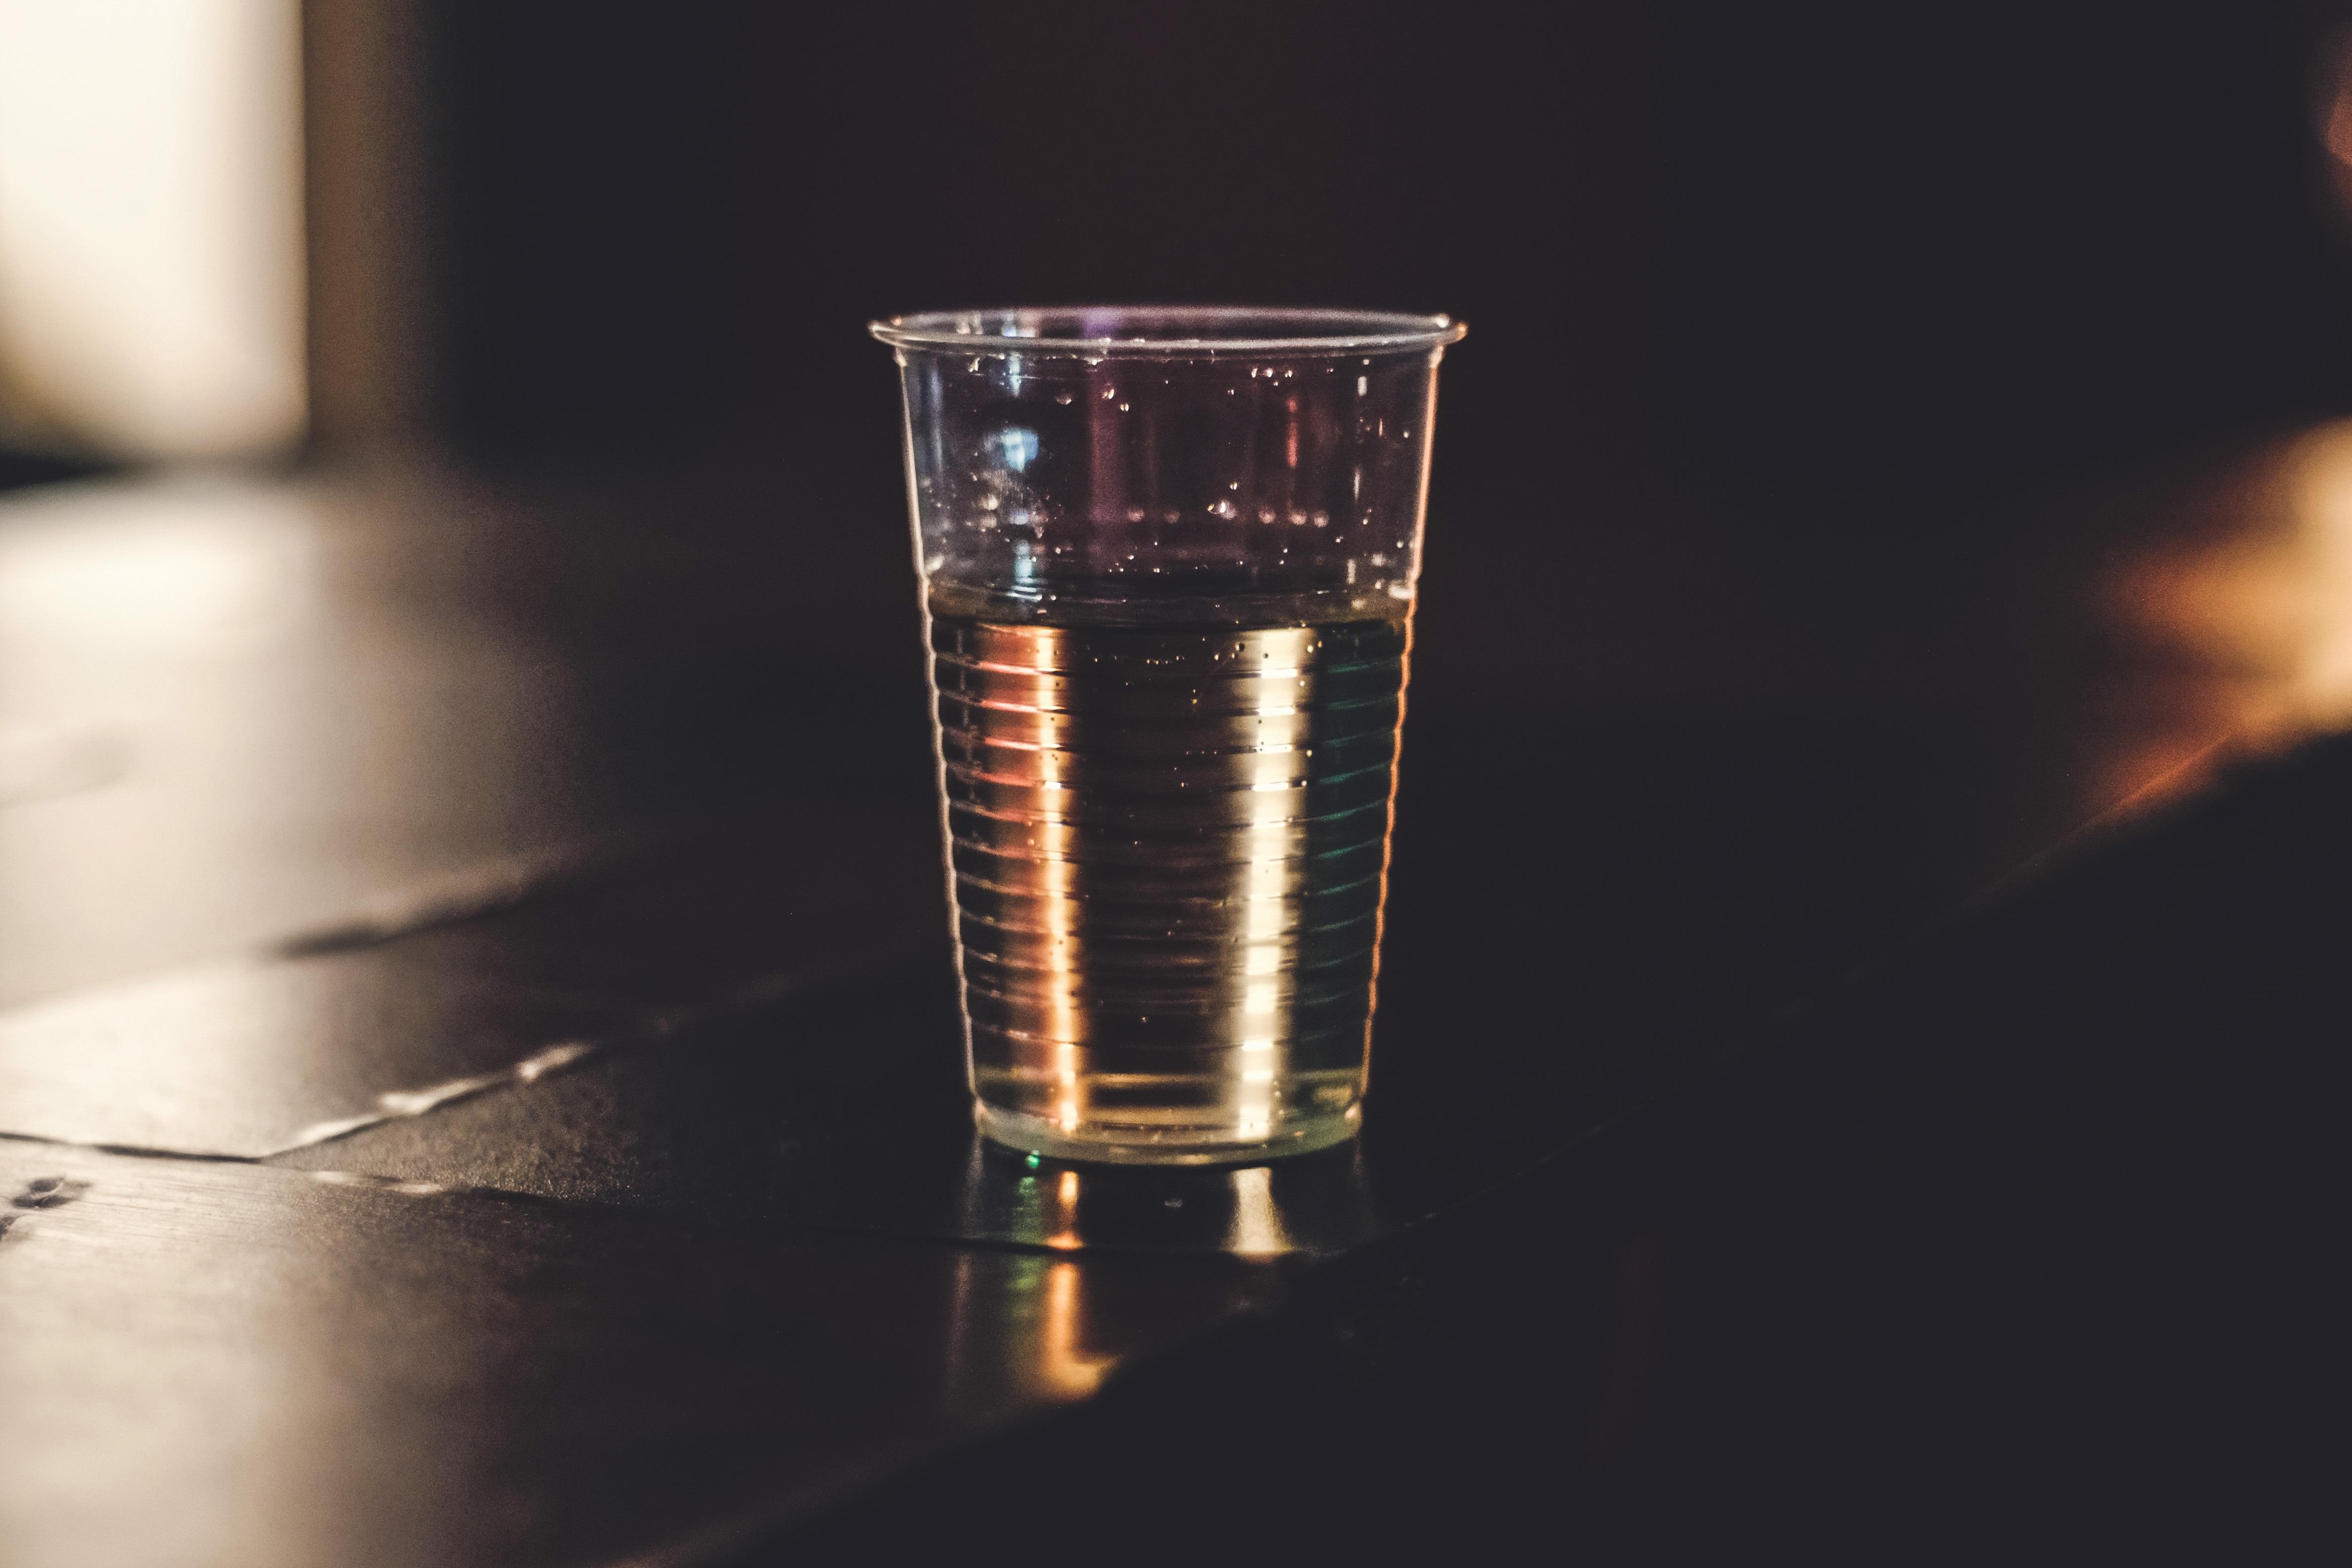 beber agua en la noche